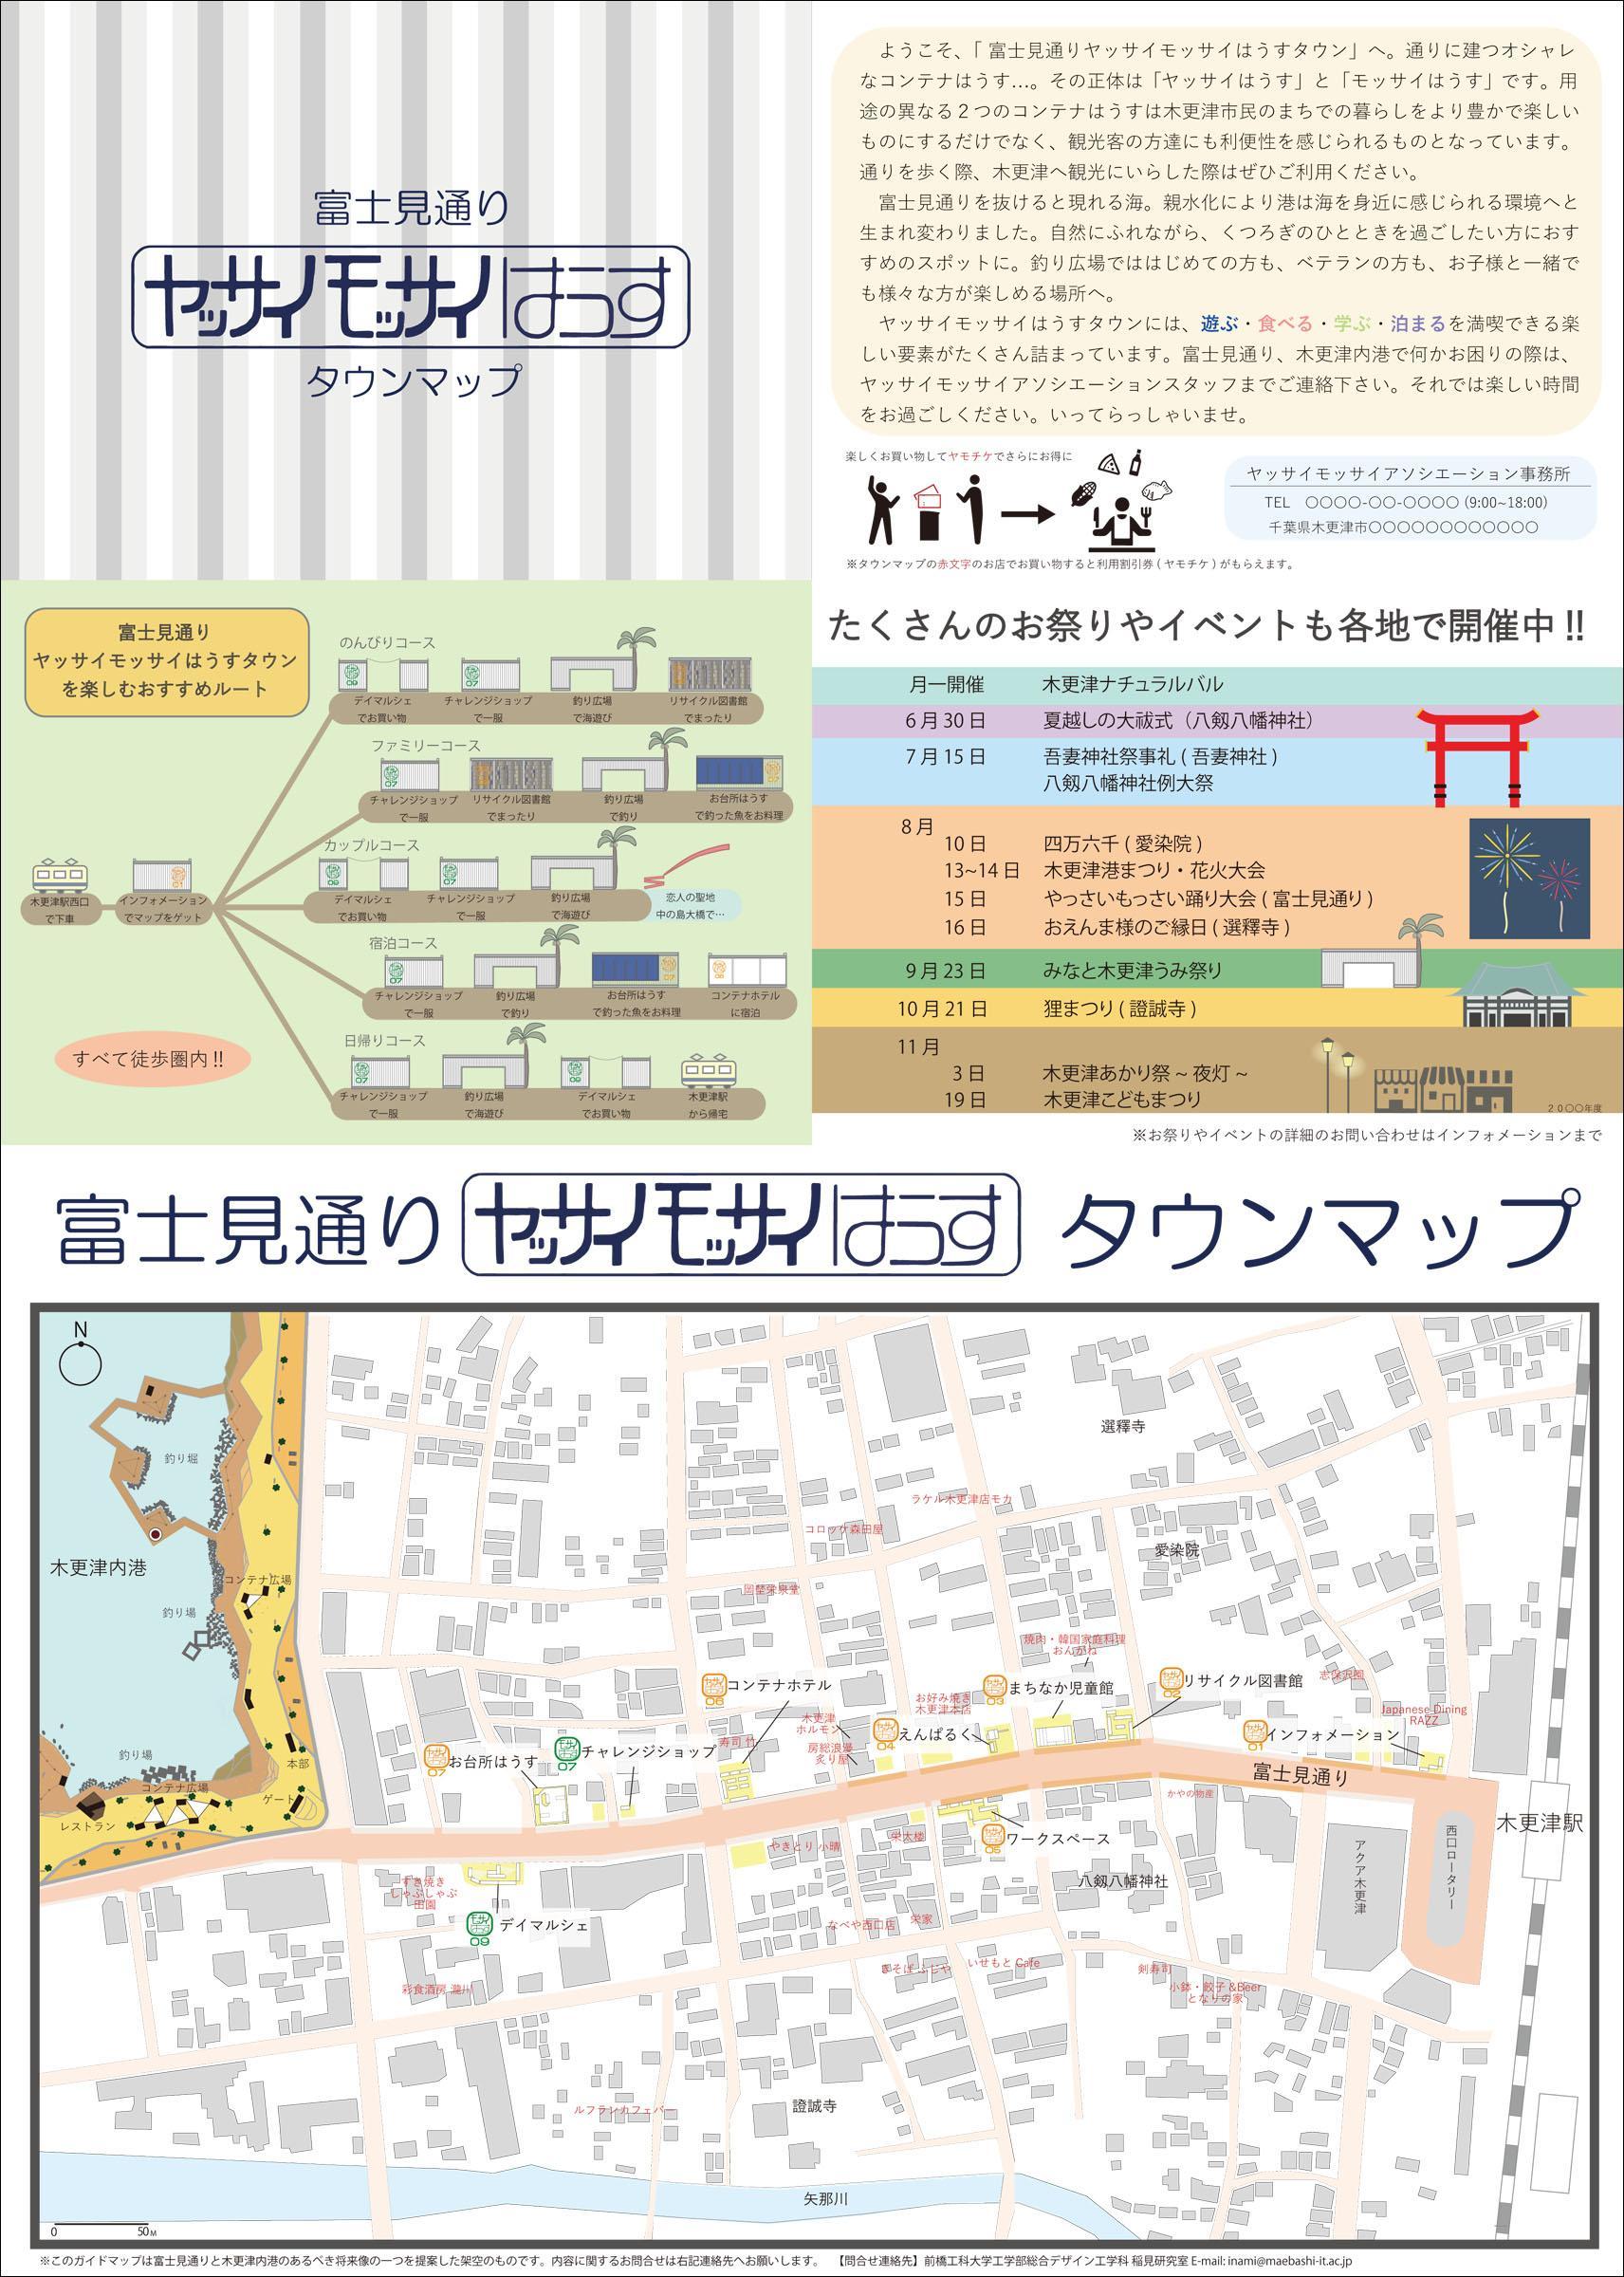 http://www.maebashi-it.ac.jp/department/ide/upload/efa70abd9b55fd111b02a0e82584eec5815d6d51.jpg